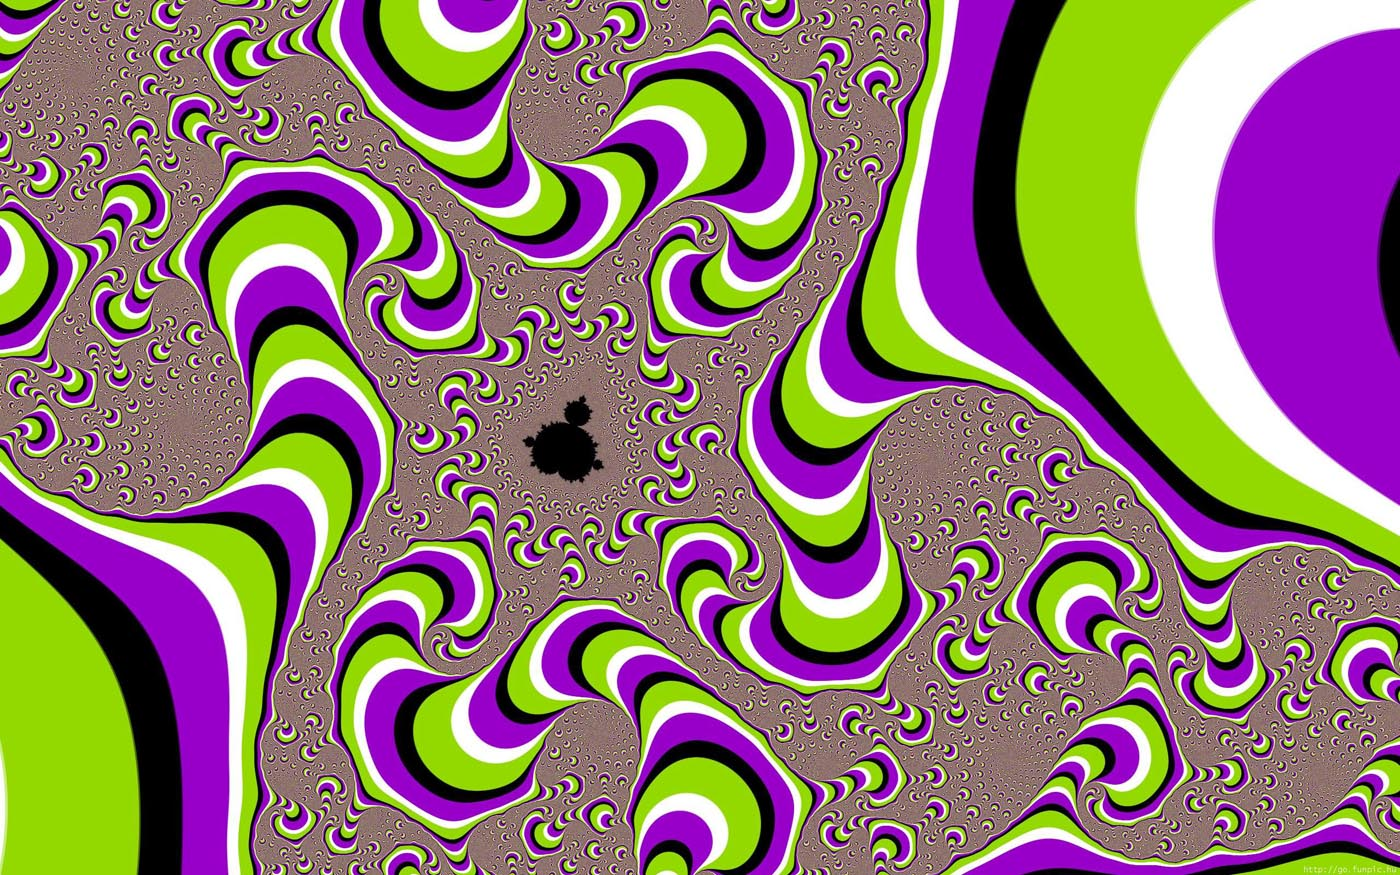 optical illusions illusion eye tricks amazing visual crazy cool weird moving creepy eyes freaky effect explanation opticalillusion ilusion dr unbelievable